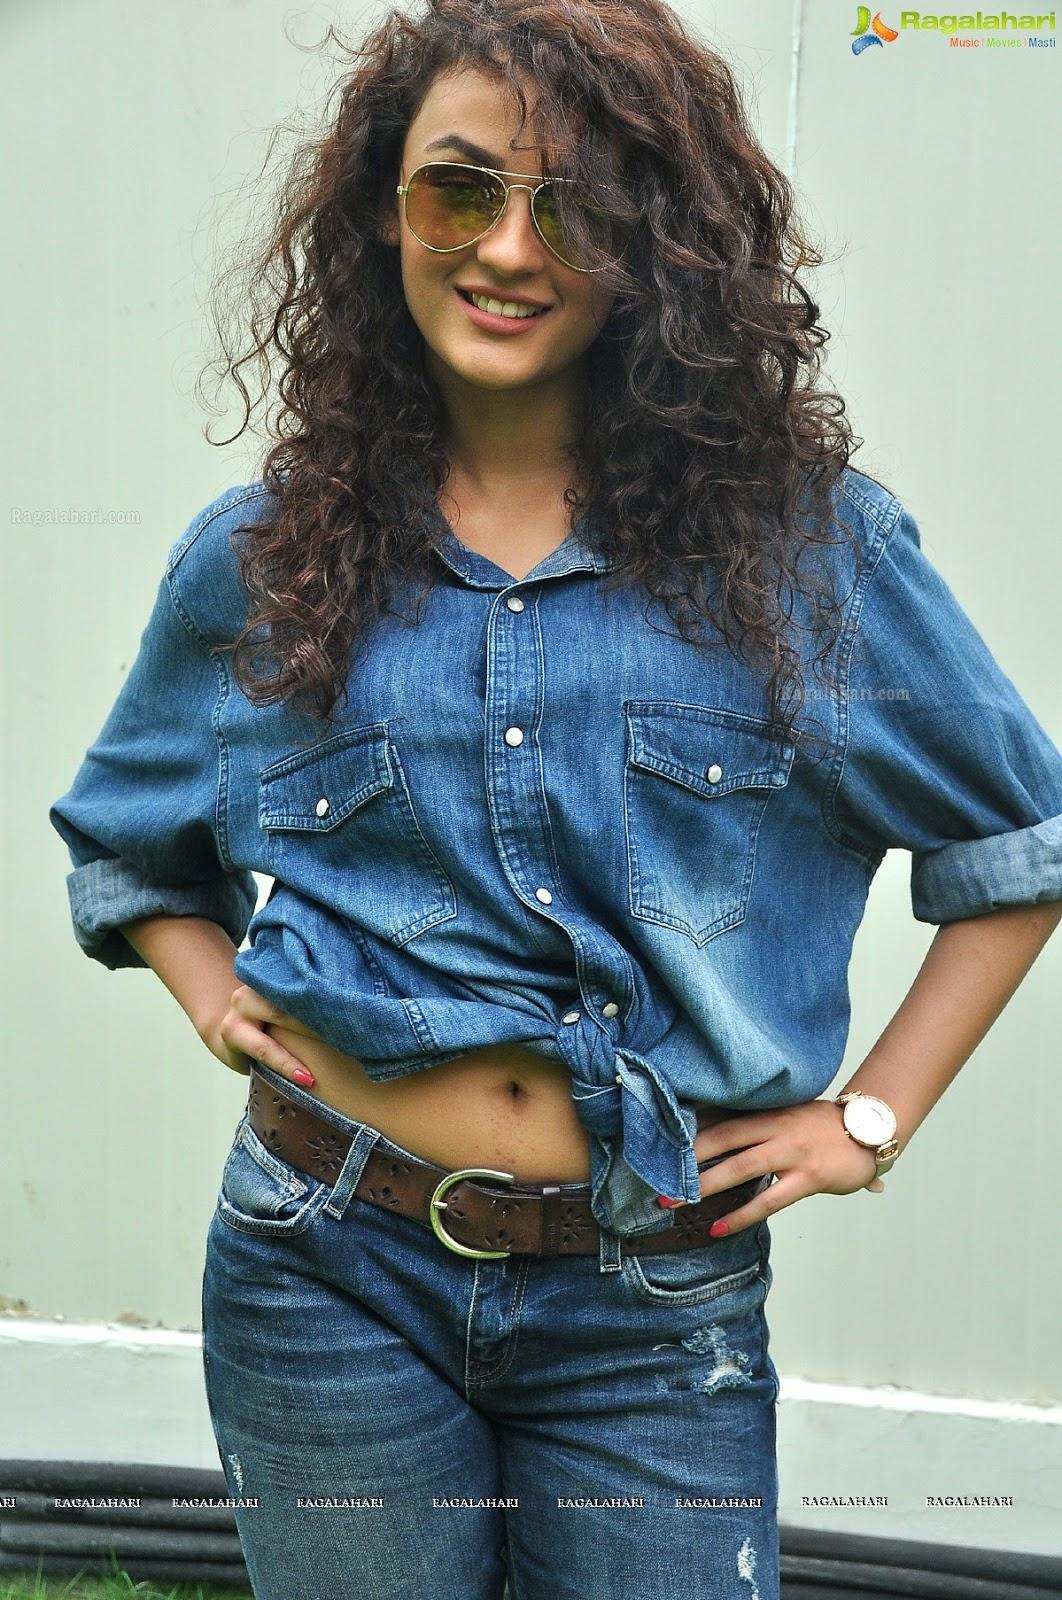 Seerat Kapoor Navel In Blue Jeans Stills Serial Actress Hot